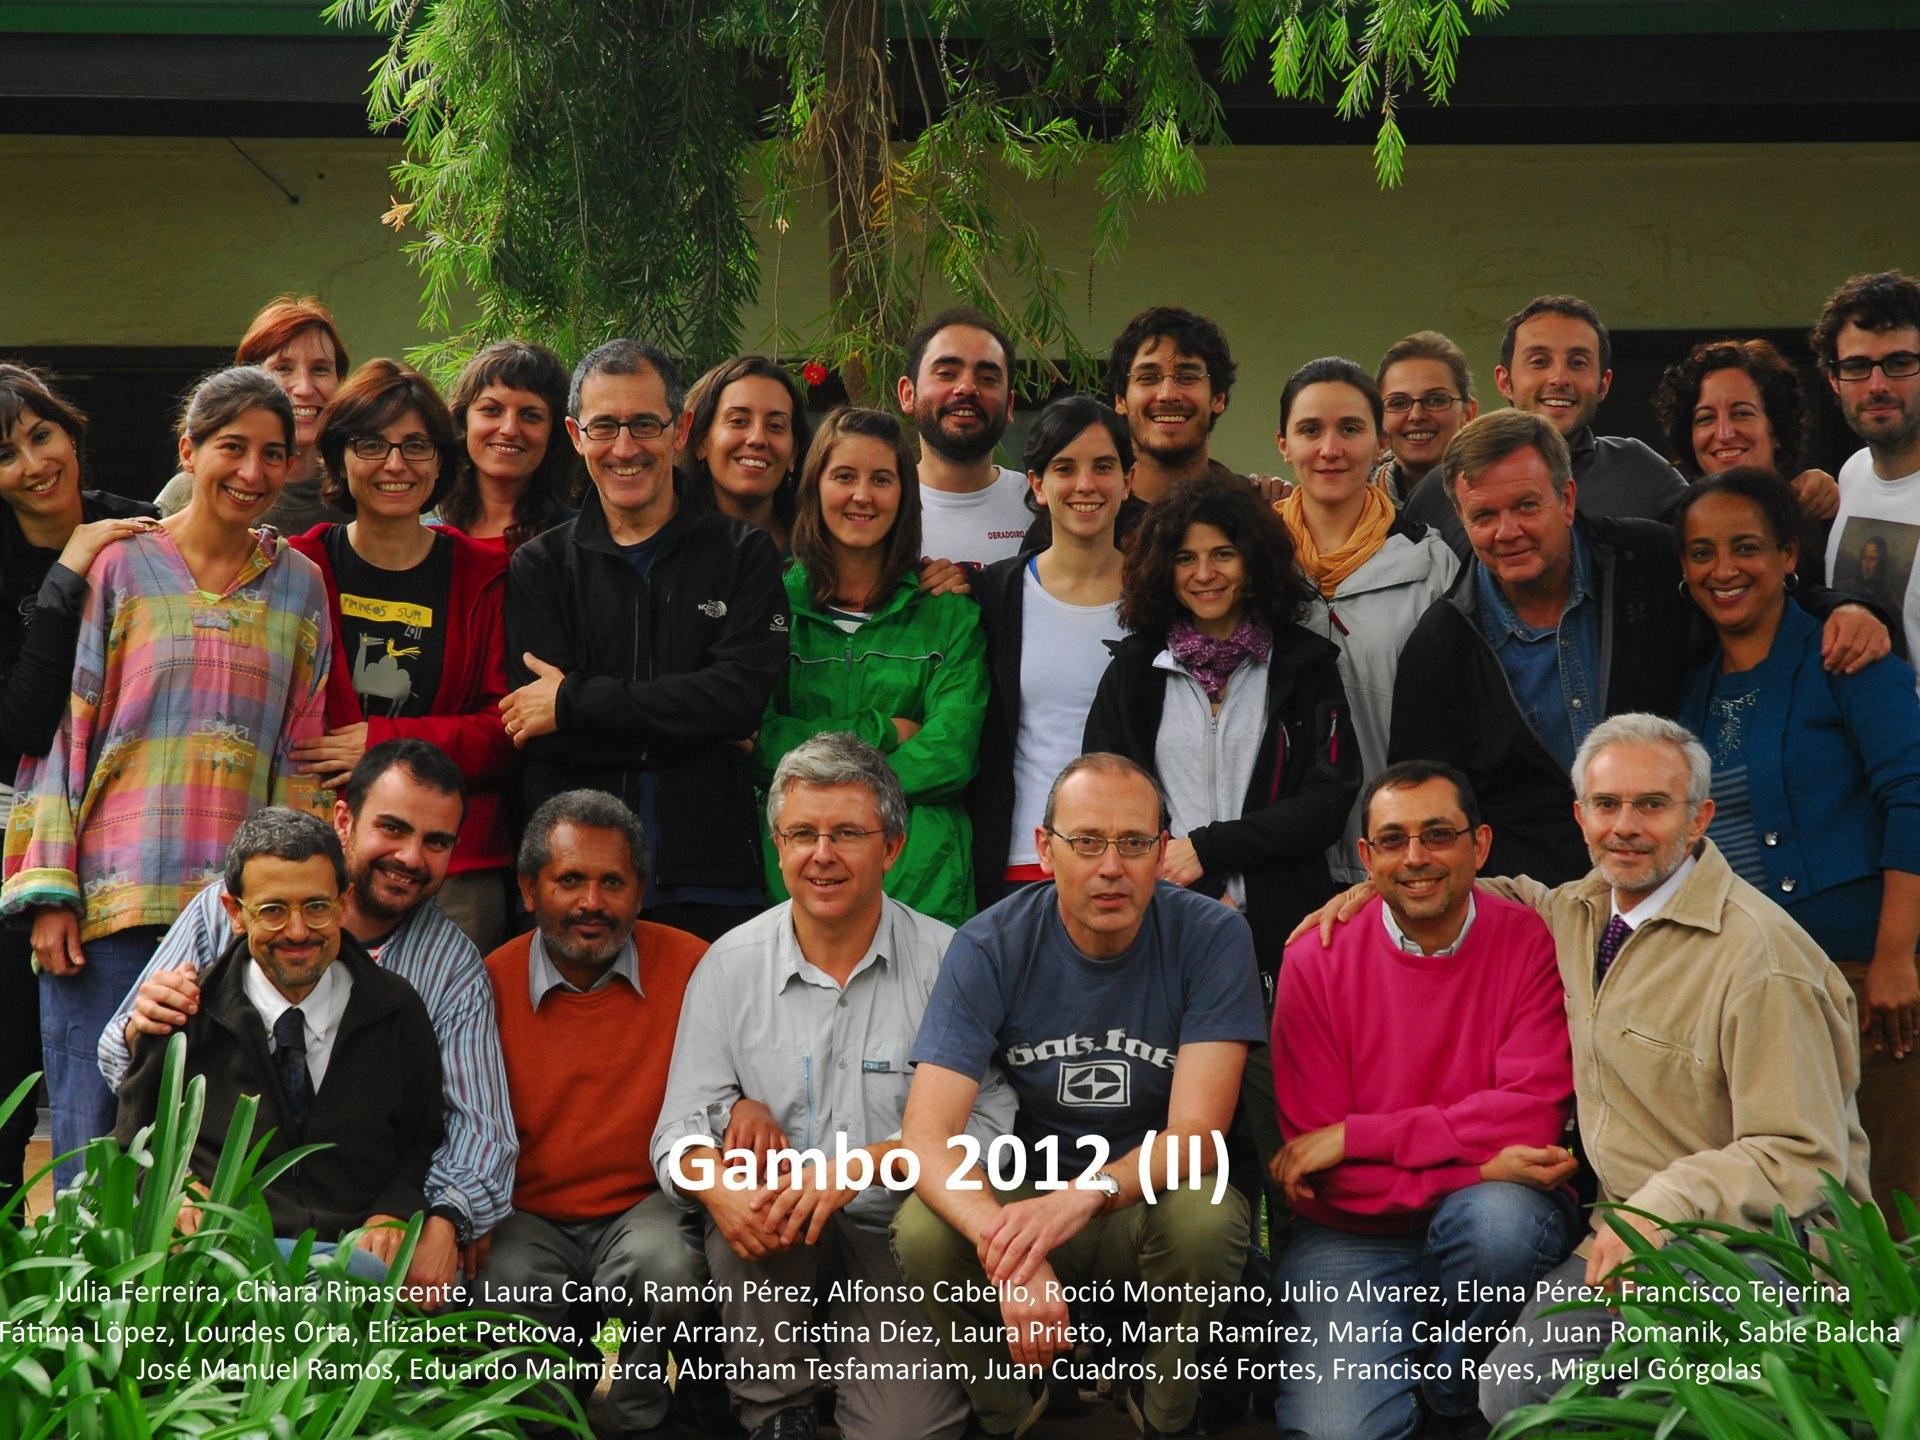 Gambo 2012 B foto grupo